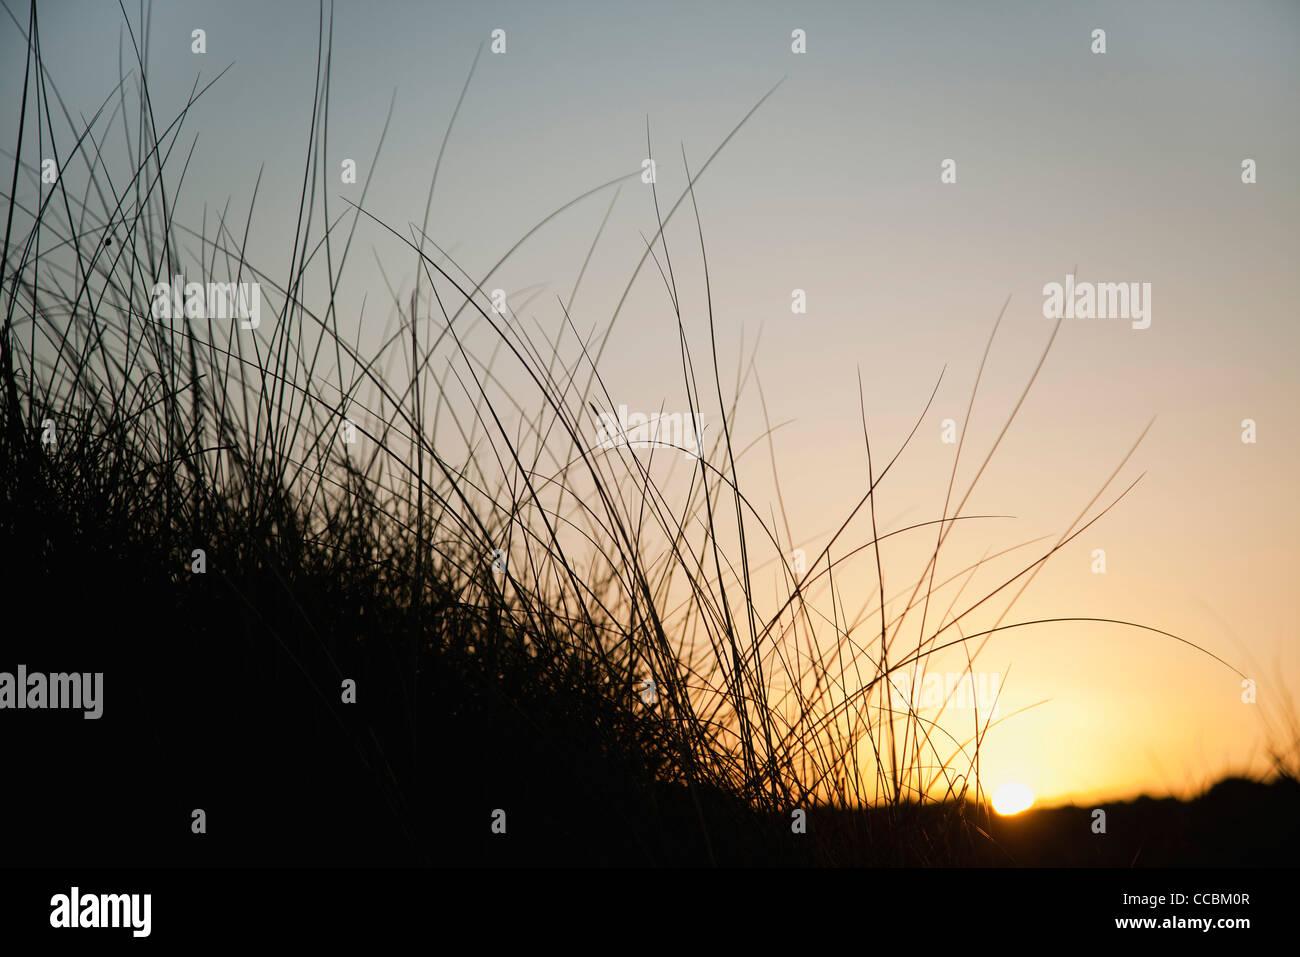 Sun setting behind tall grass - Stock Image